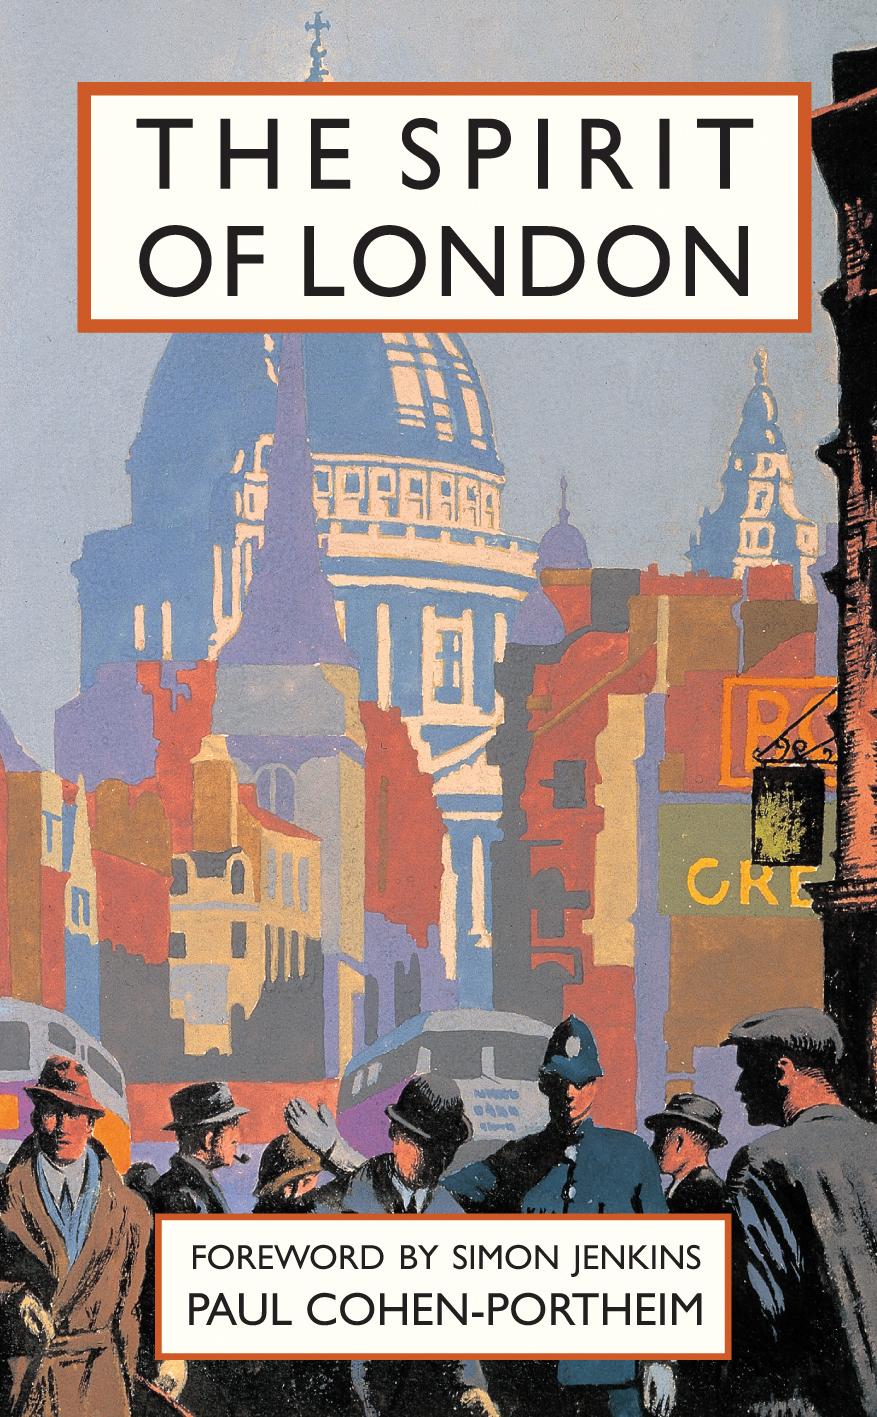 The Spirit of London